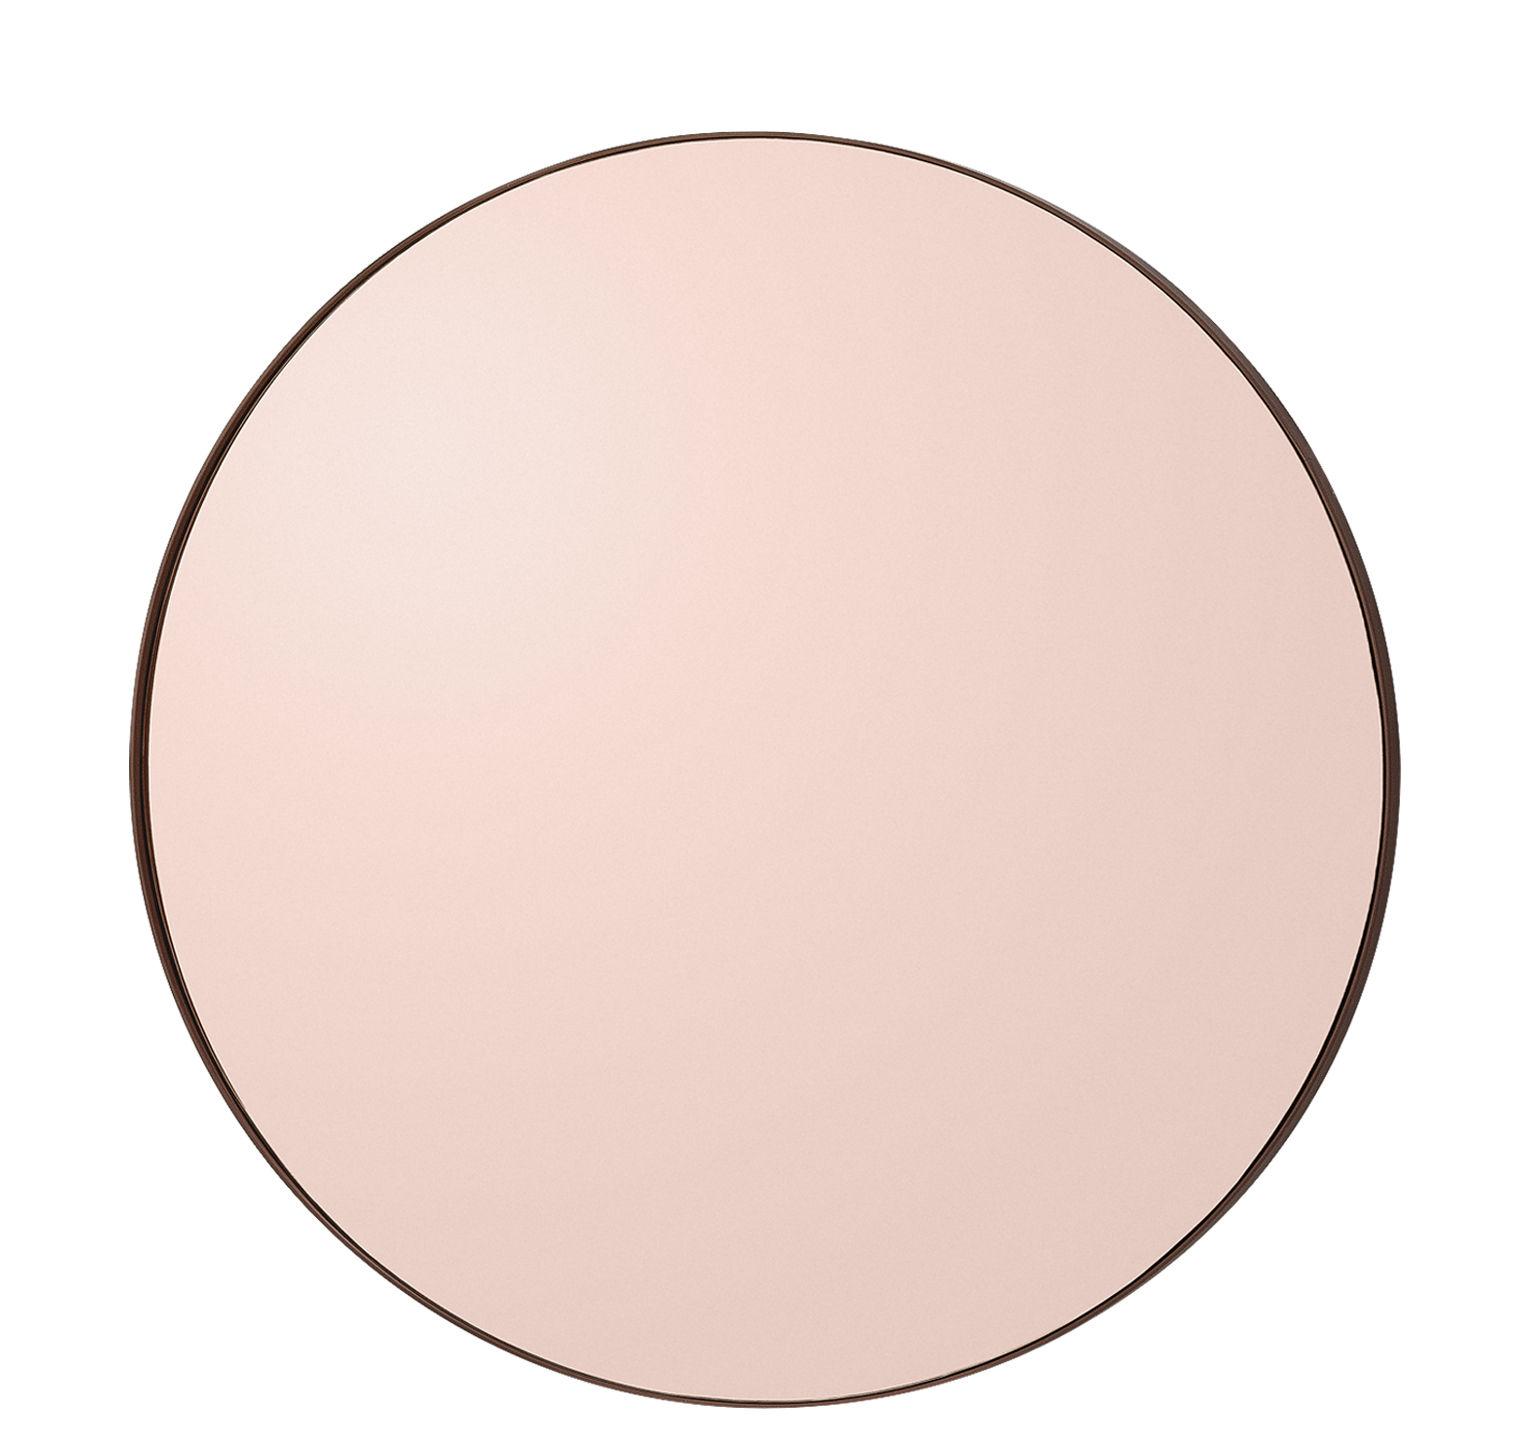 Déco - Miroirs - Miroir mural Circum Small / Ø 70 cm - AYTM - Rose fumé / Cadre rose - MDF peint, Verre